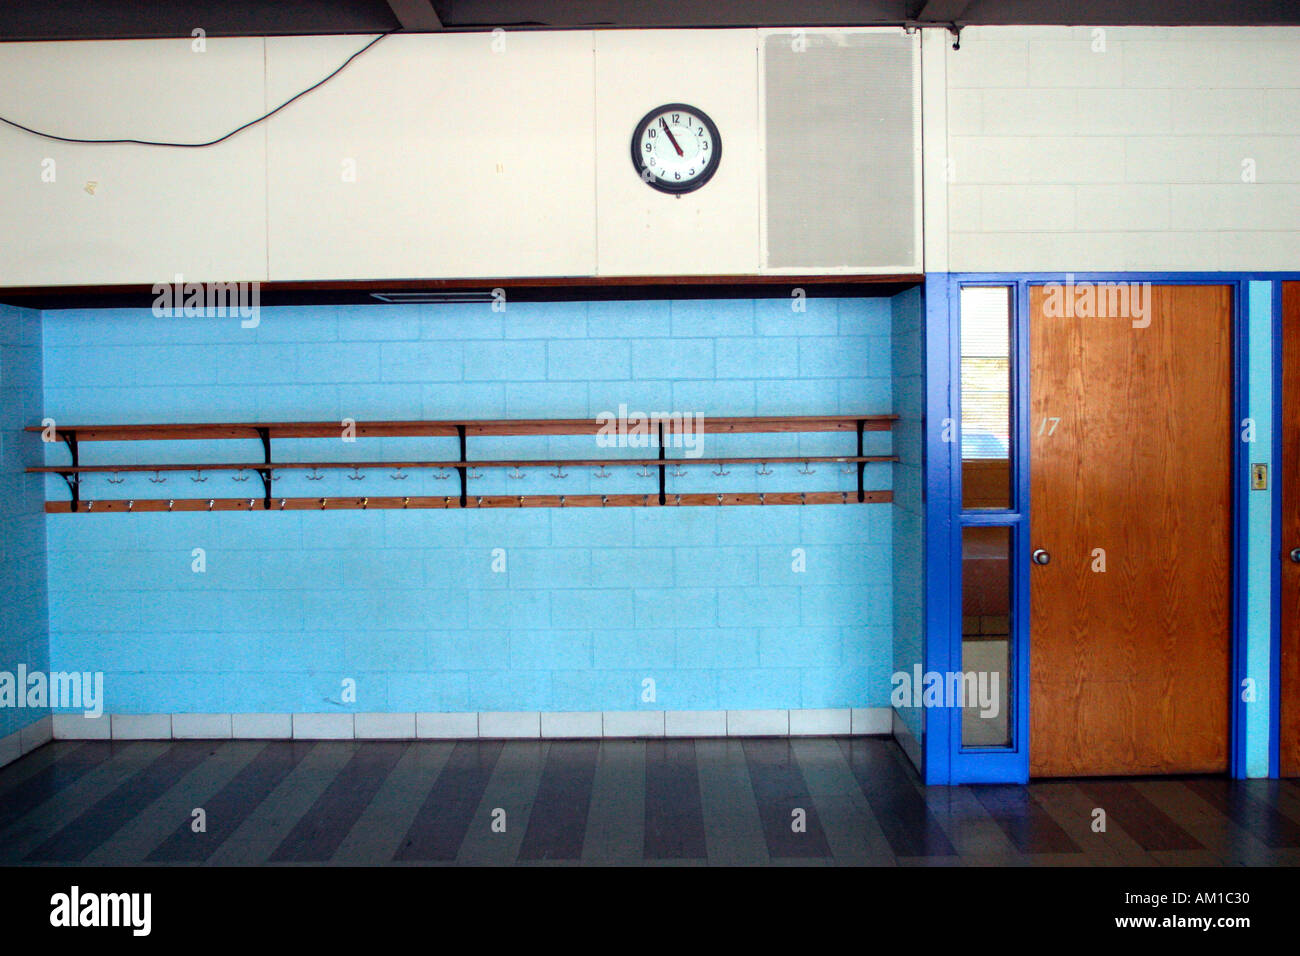 Empty Elementary School Classroom - Stock Image